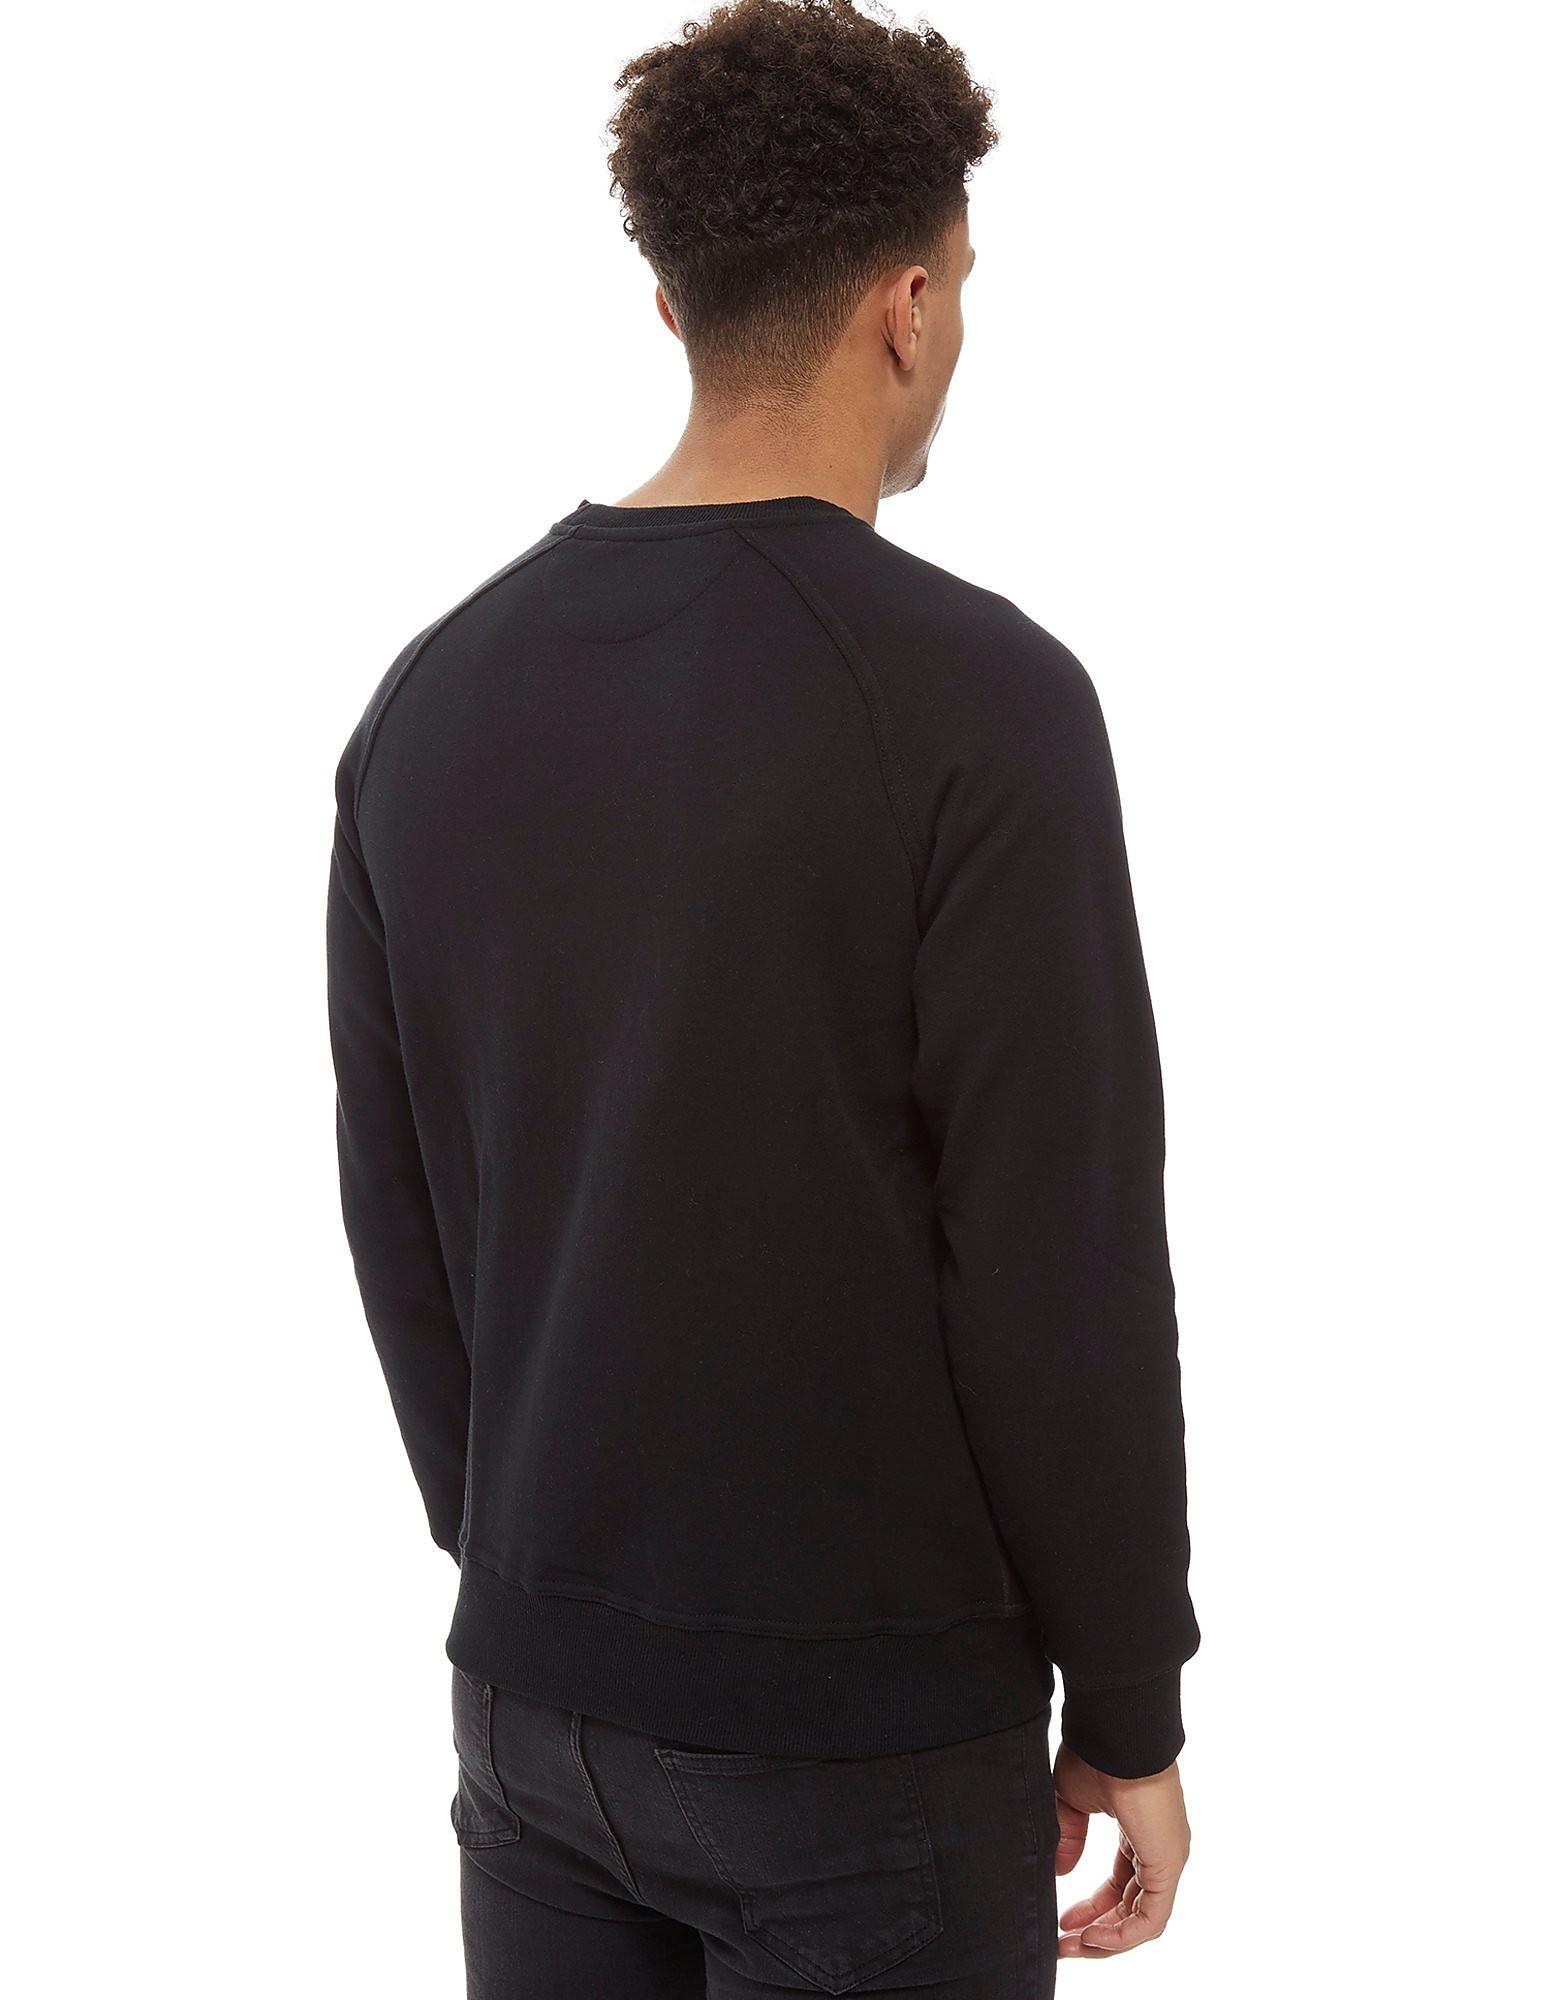 McKenzie Shay Crew 2 Sweatshirt